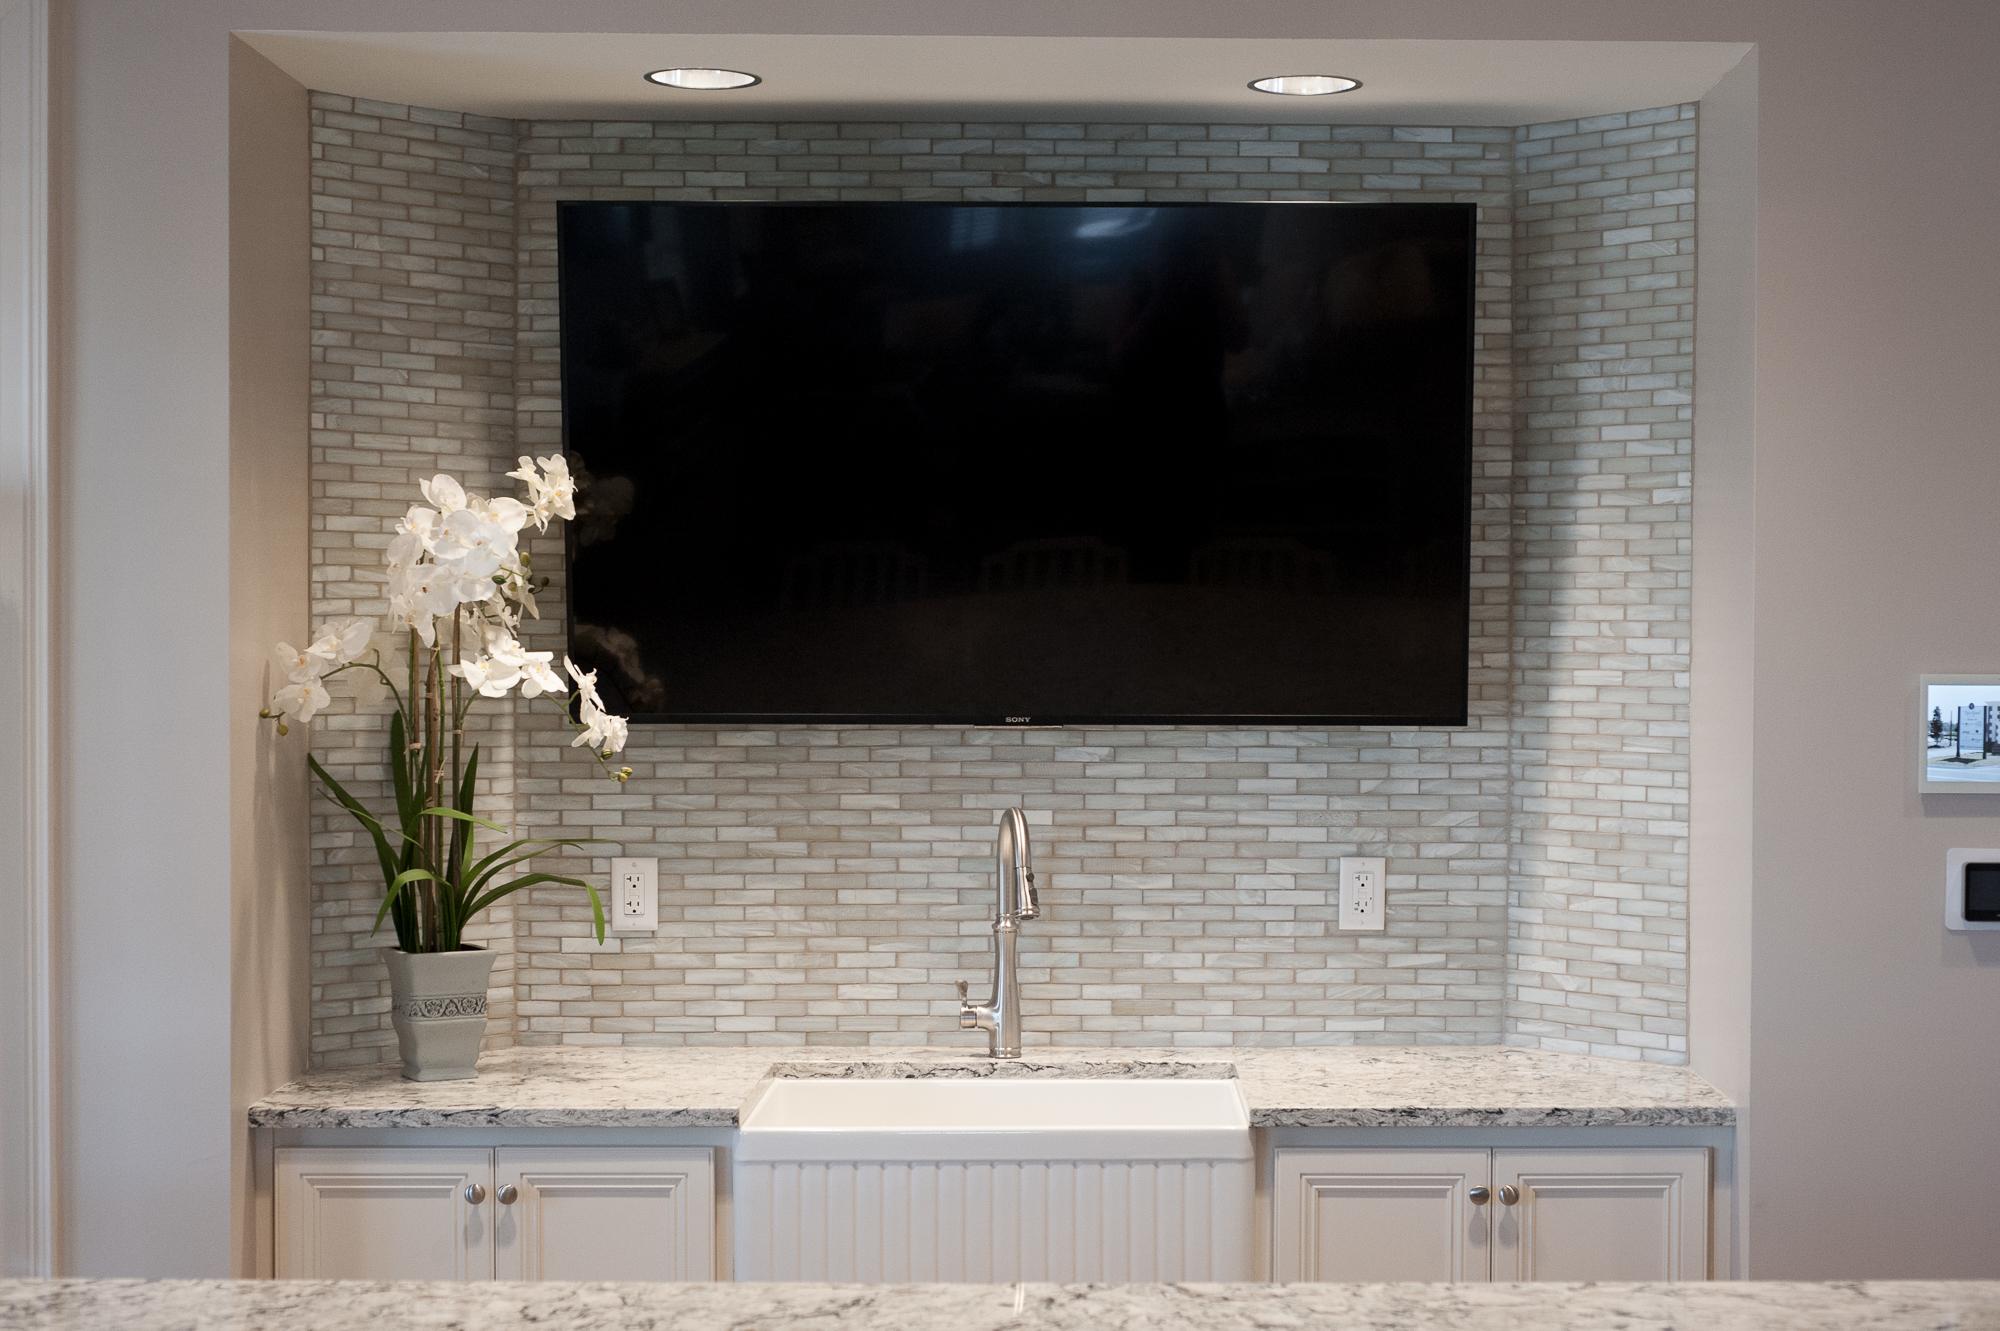 Micamy_Design_Studio_Interior_Design_Markland_StAugustine_Clubhouse_OldFlorida_Coastal_Glass_Mosaic_Tile_Backsplash_Kitchen_Cambria_Kohler_Blue_ (2).jpg